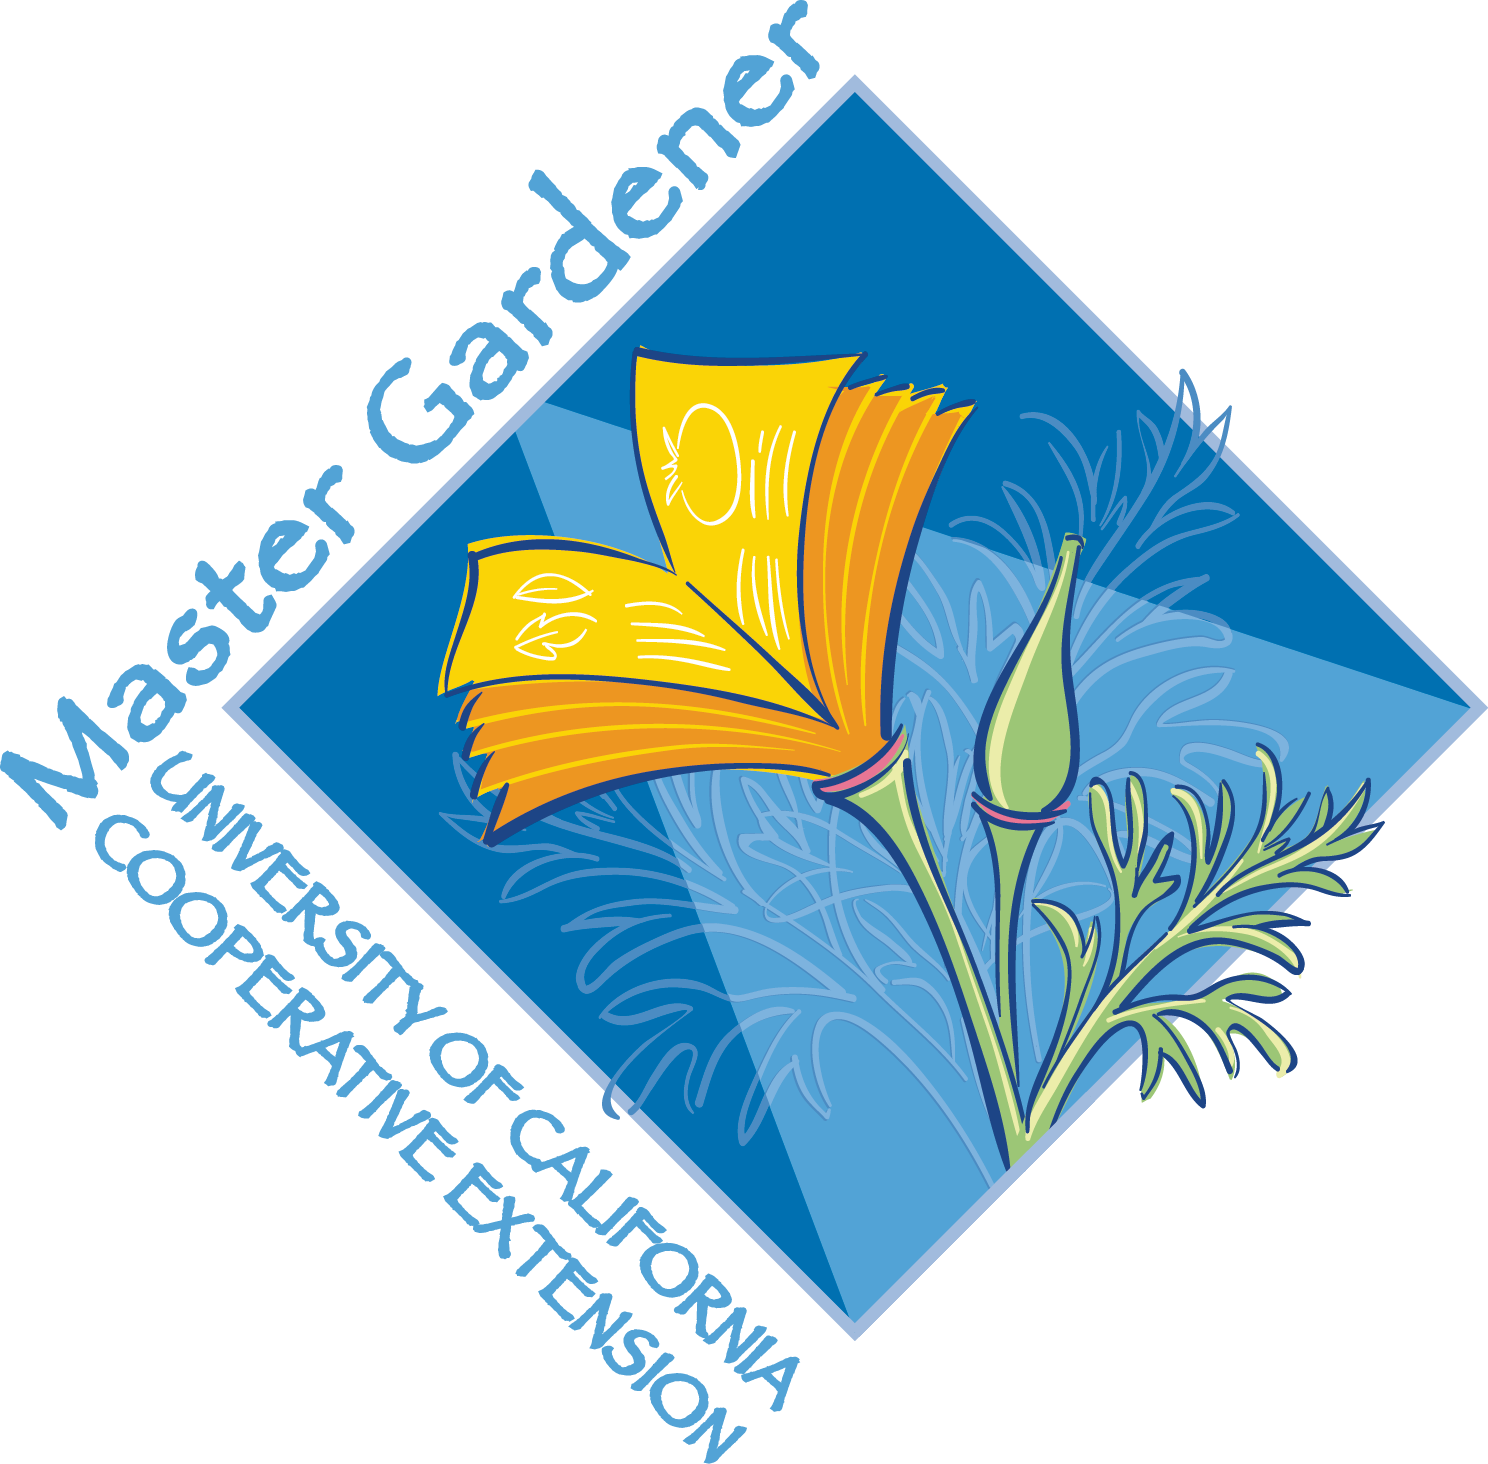 8a2483eff5ffe5200bdfd62f11873f23 - University Of California Master Gardener Program